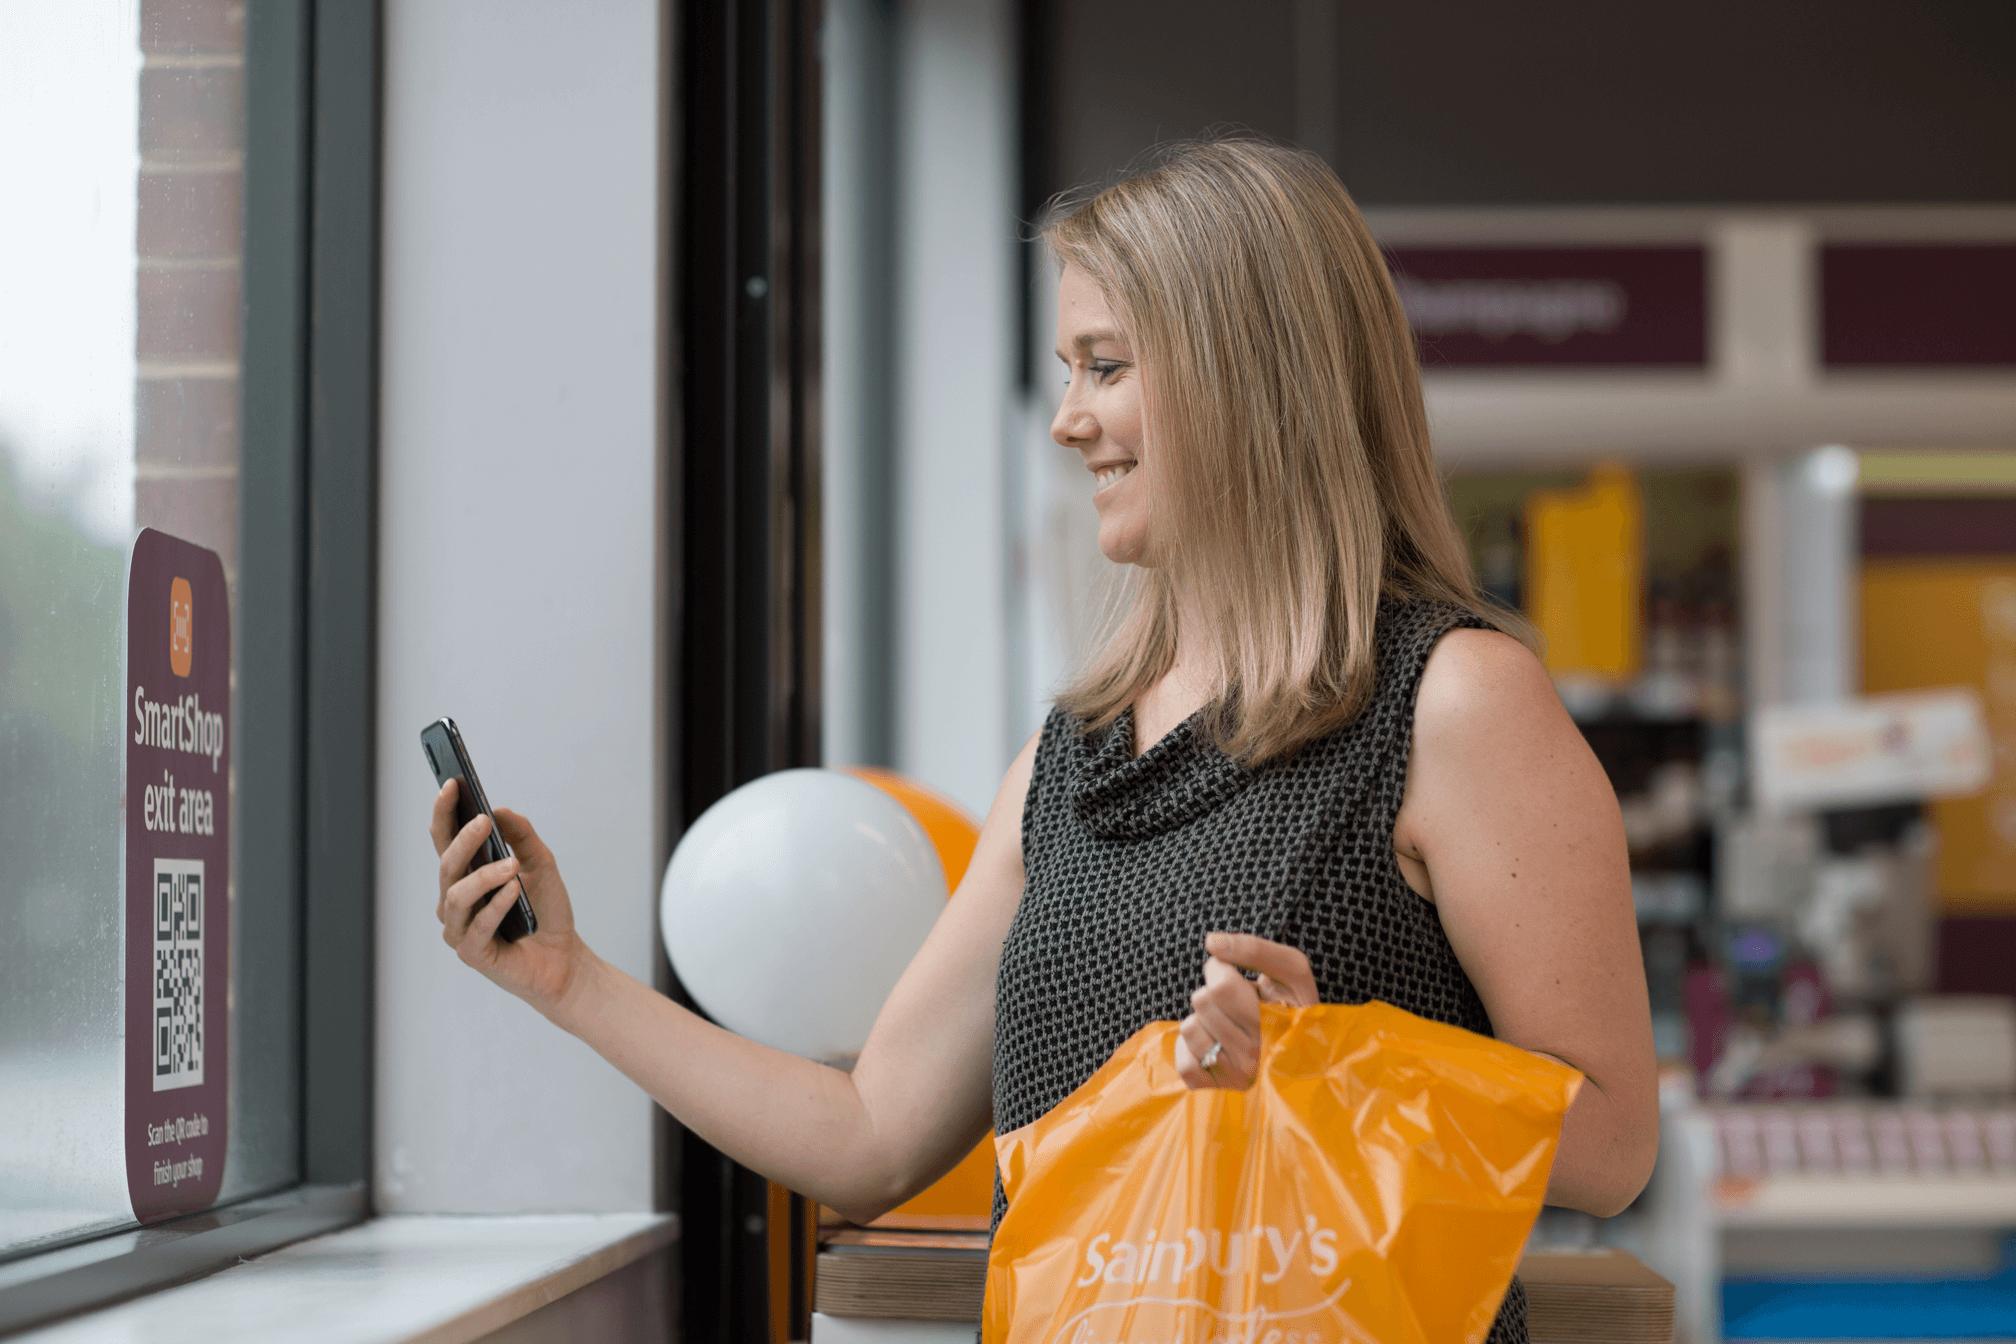 Sainsburys-SmartShop-scan-pay-&-go-trial--customer-scanning-Exit-QR-code-to-finish-shop